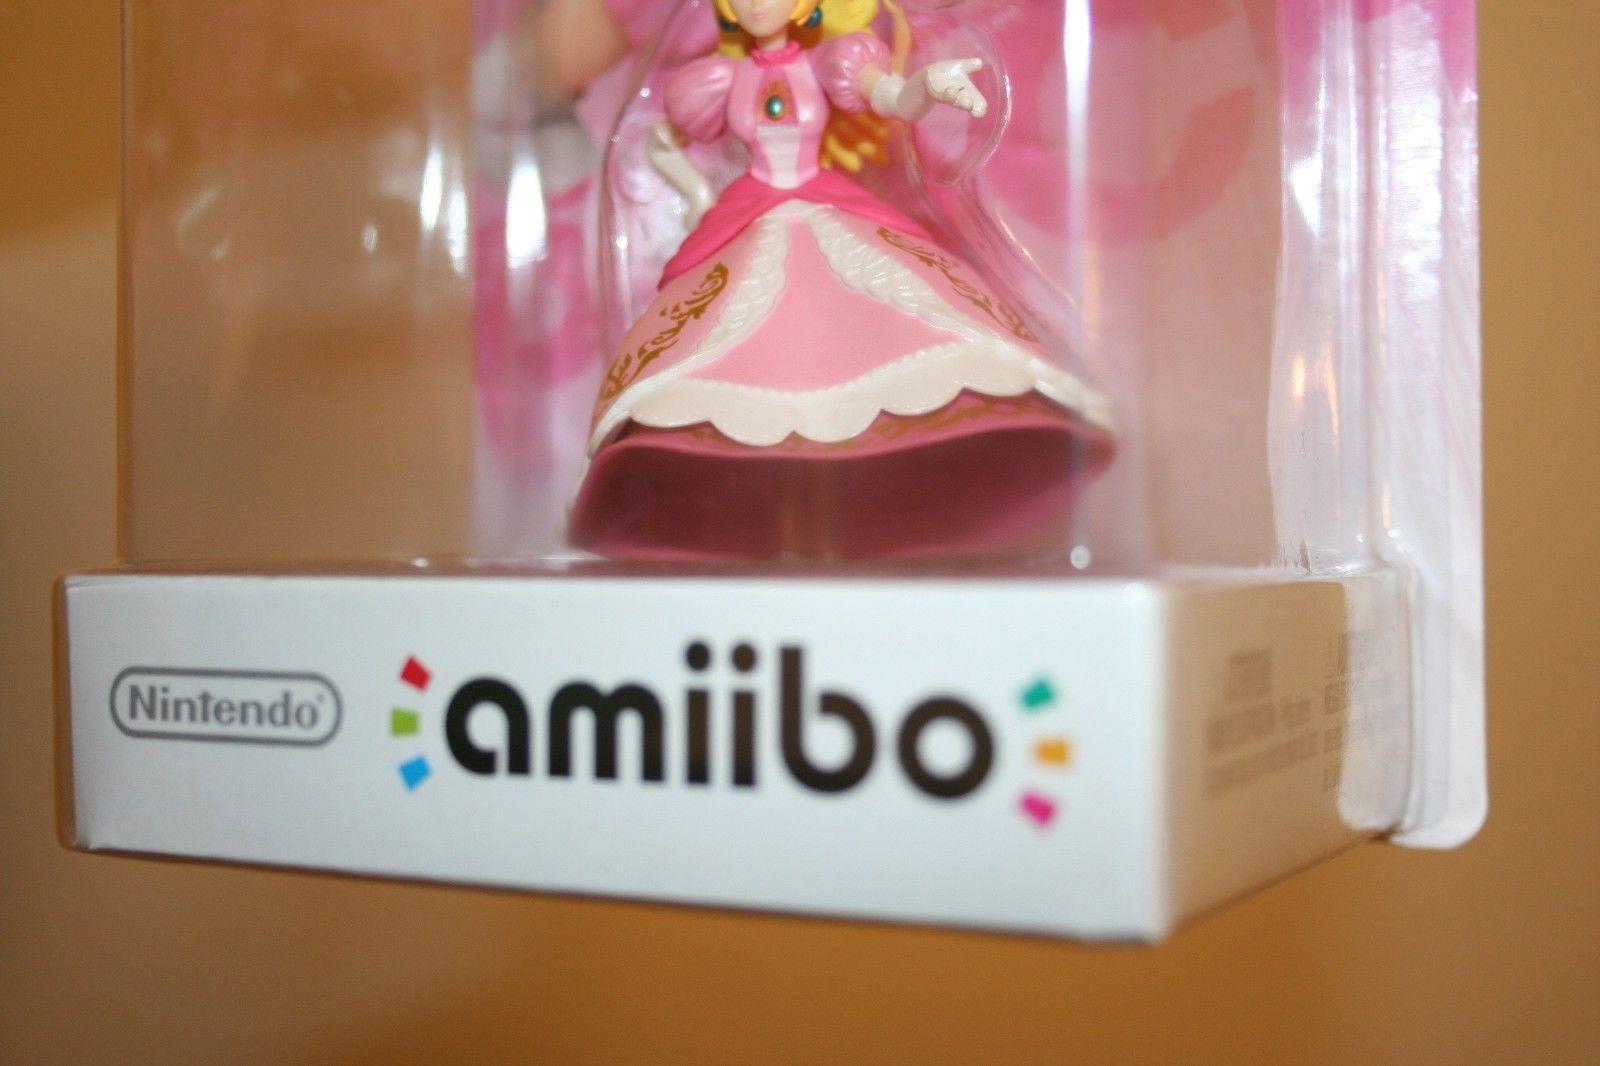 AmiiboPeach_04